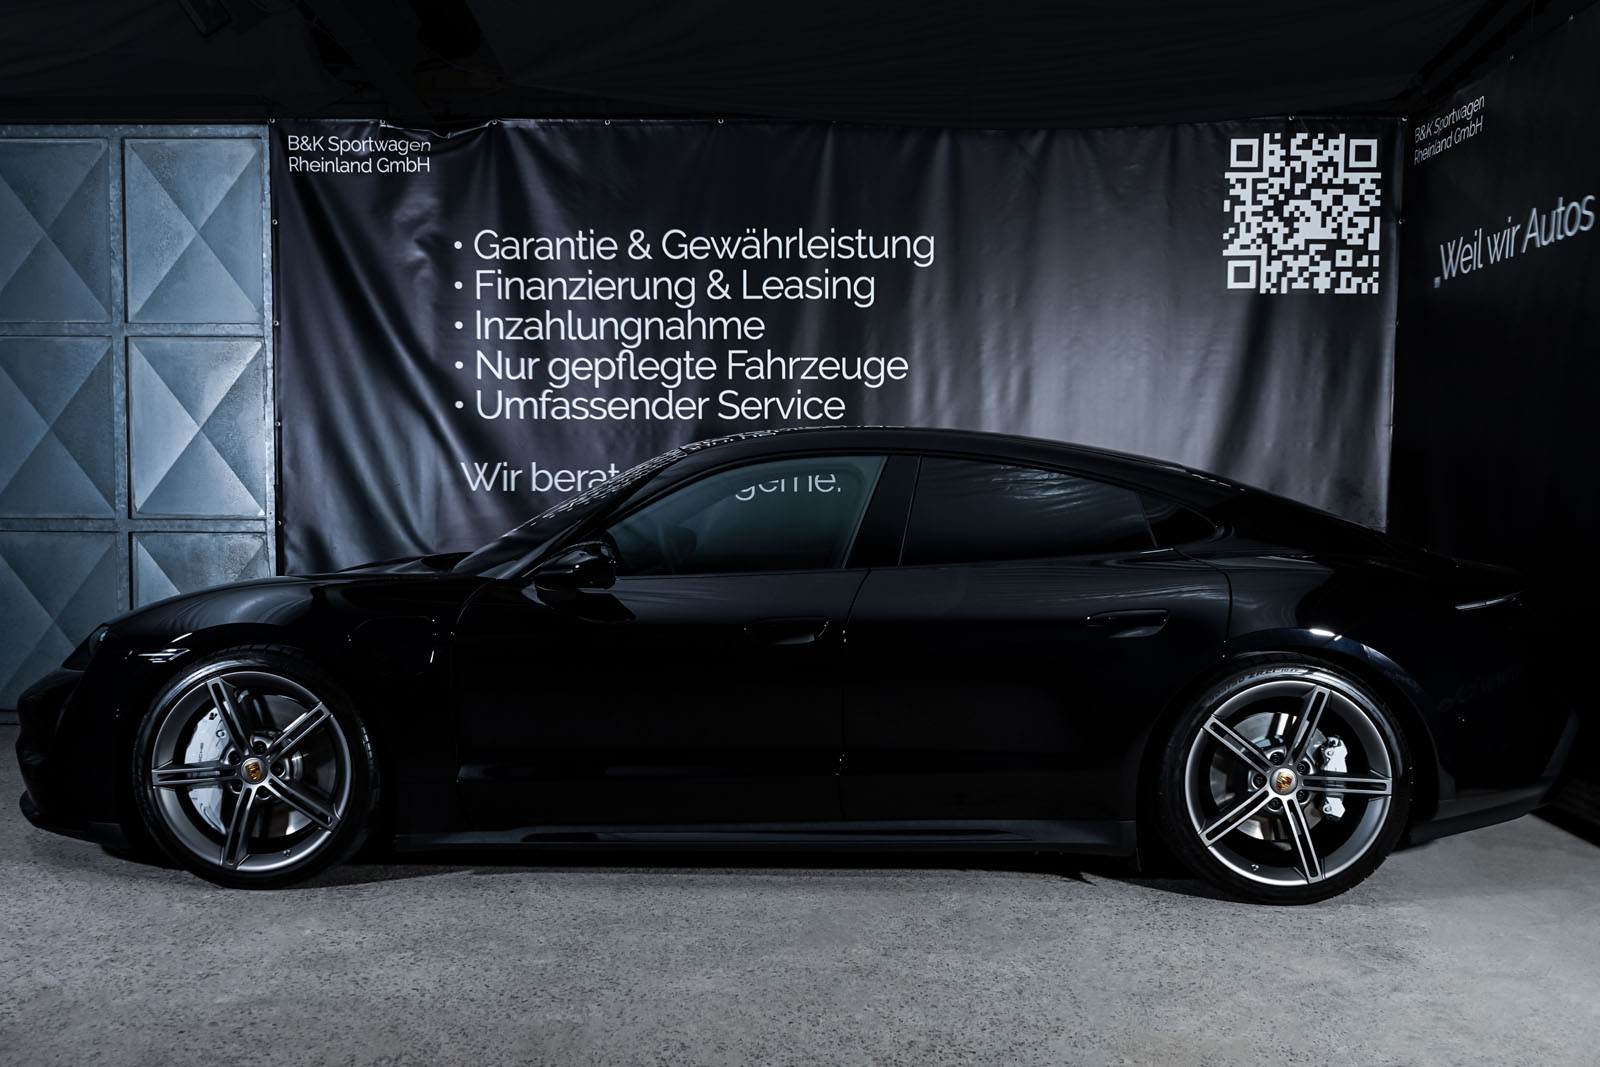 Porsche_Taycan_Turbo_Schwarz_Schwarz_POR-8106_5_w